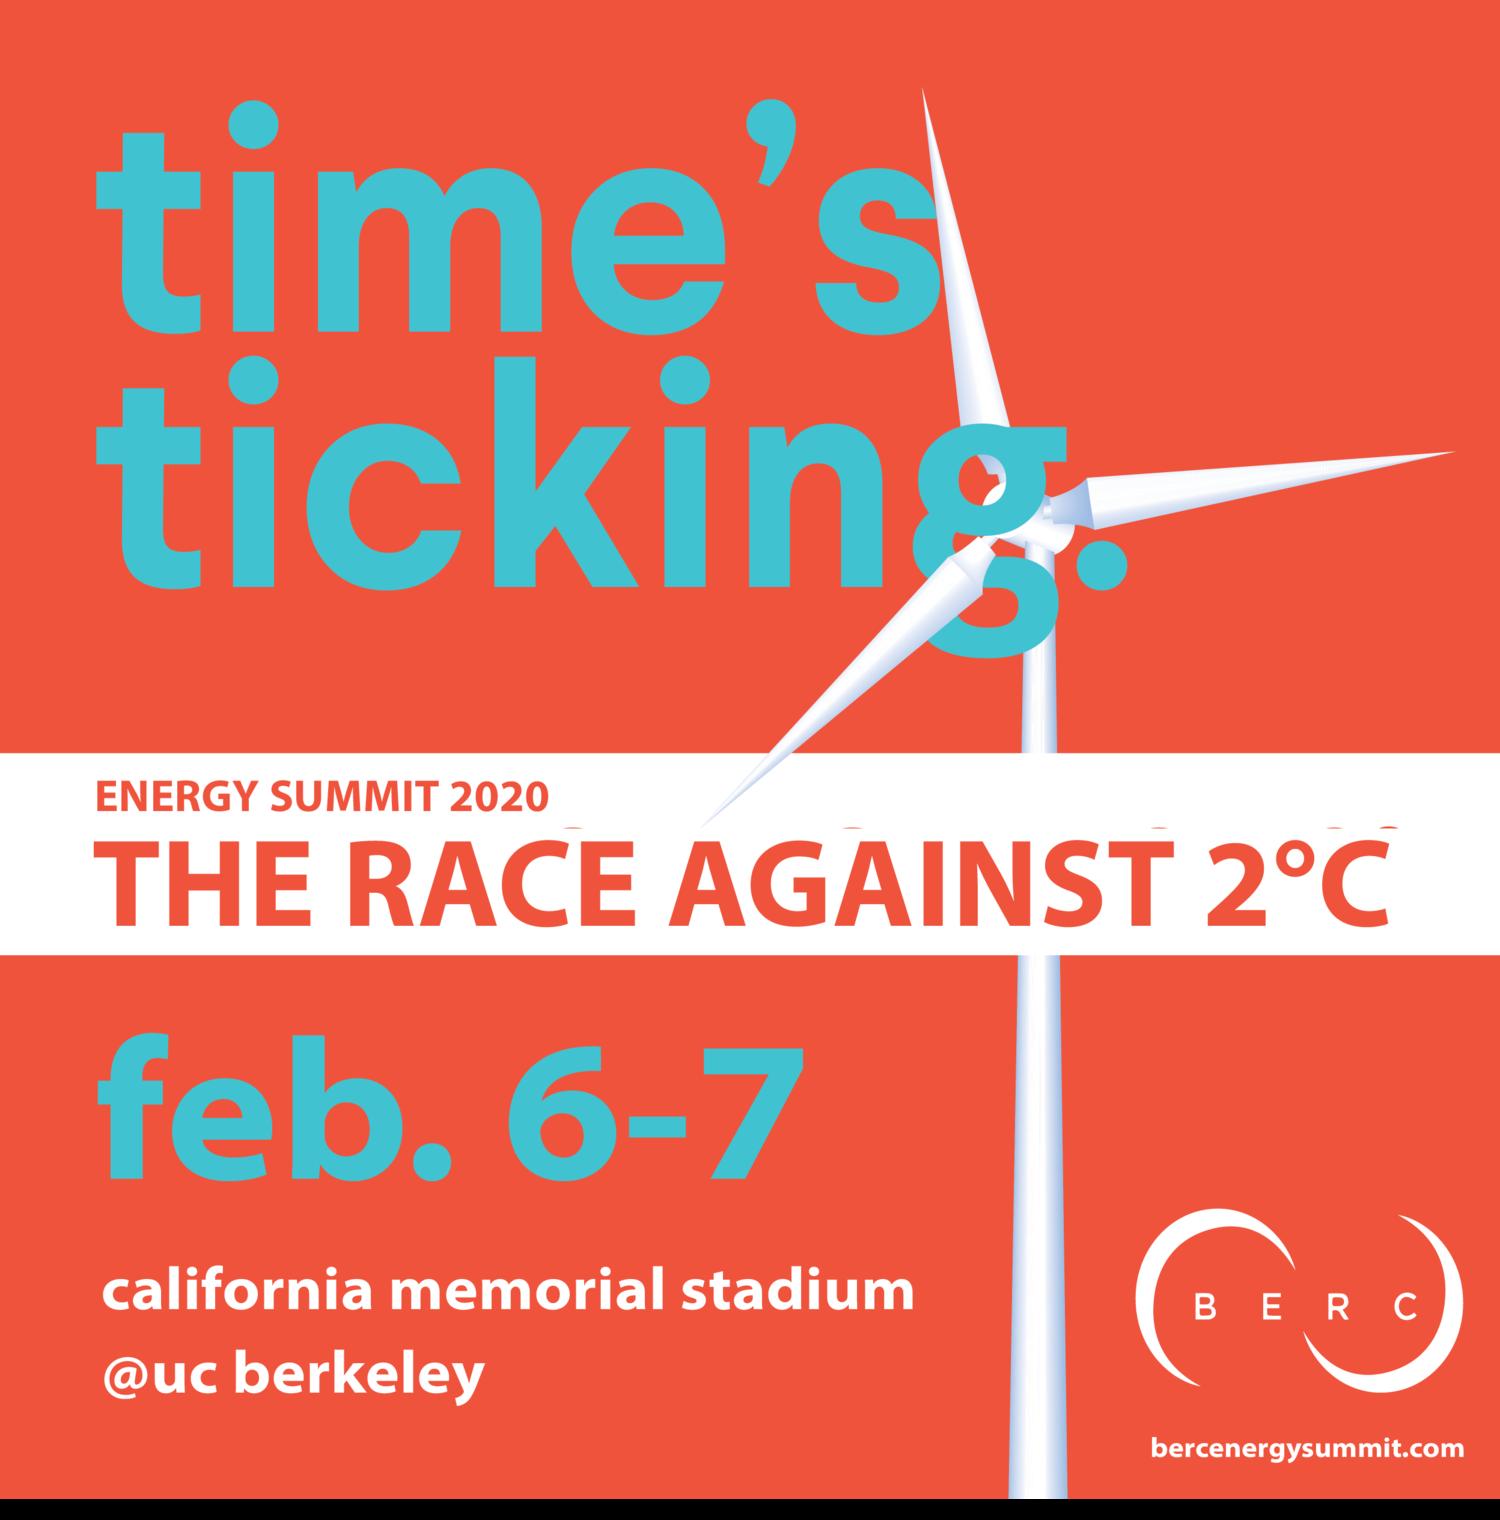 Uc Berkeley Fall 2020 Final Schedule.Berc Energy Summit